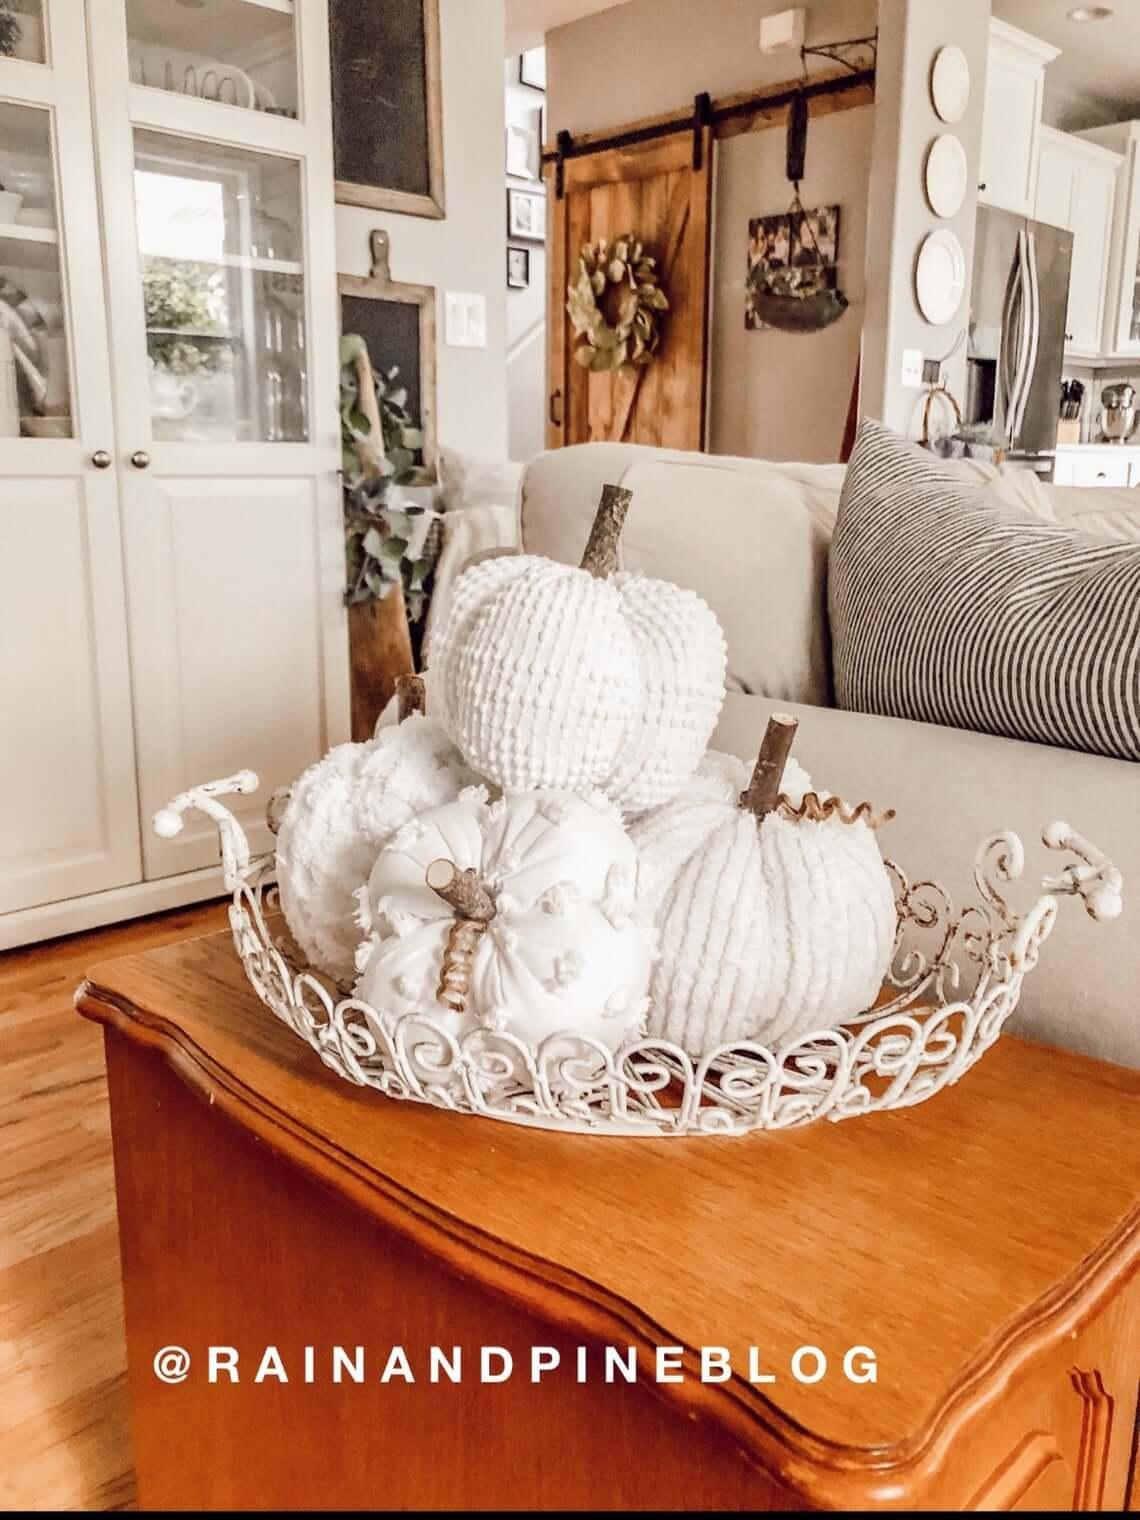 Charming Chenille Companions Set of Pumpkins